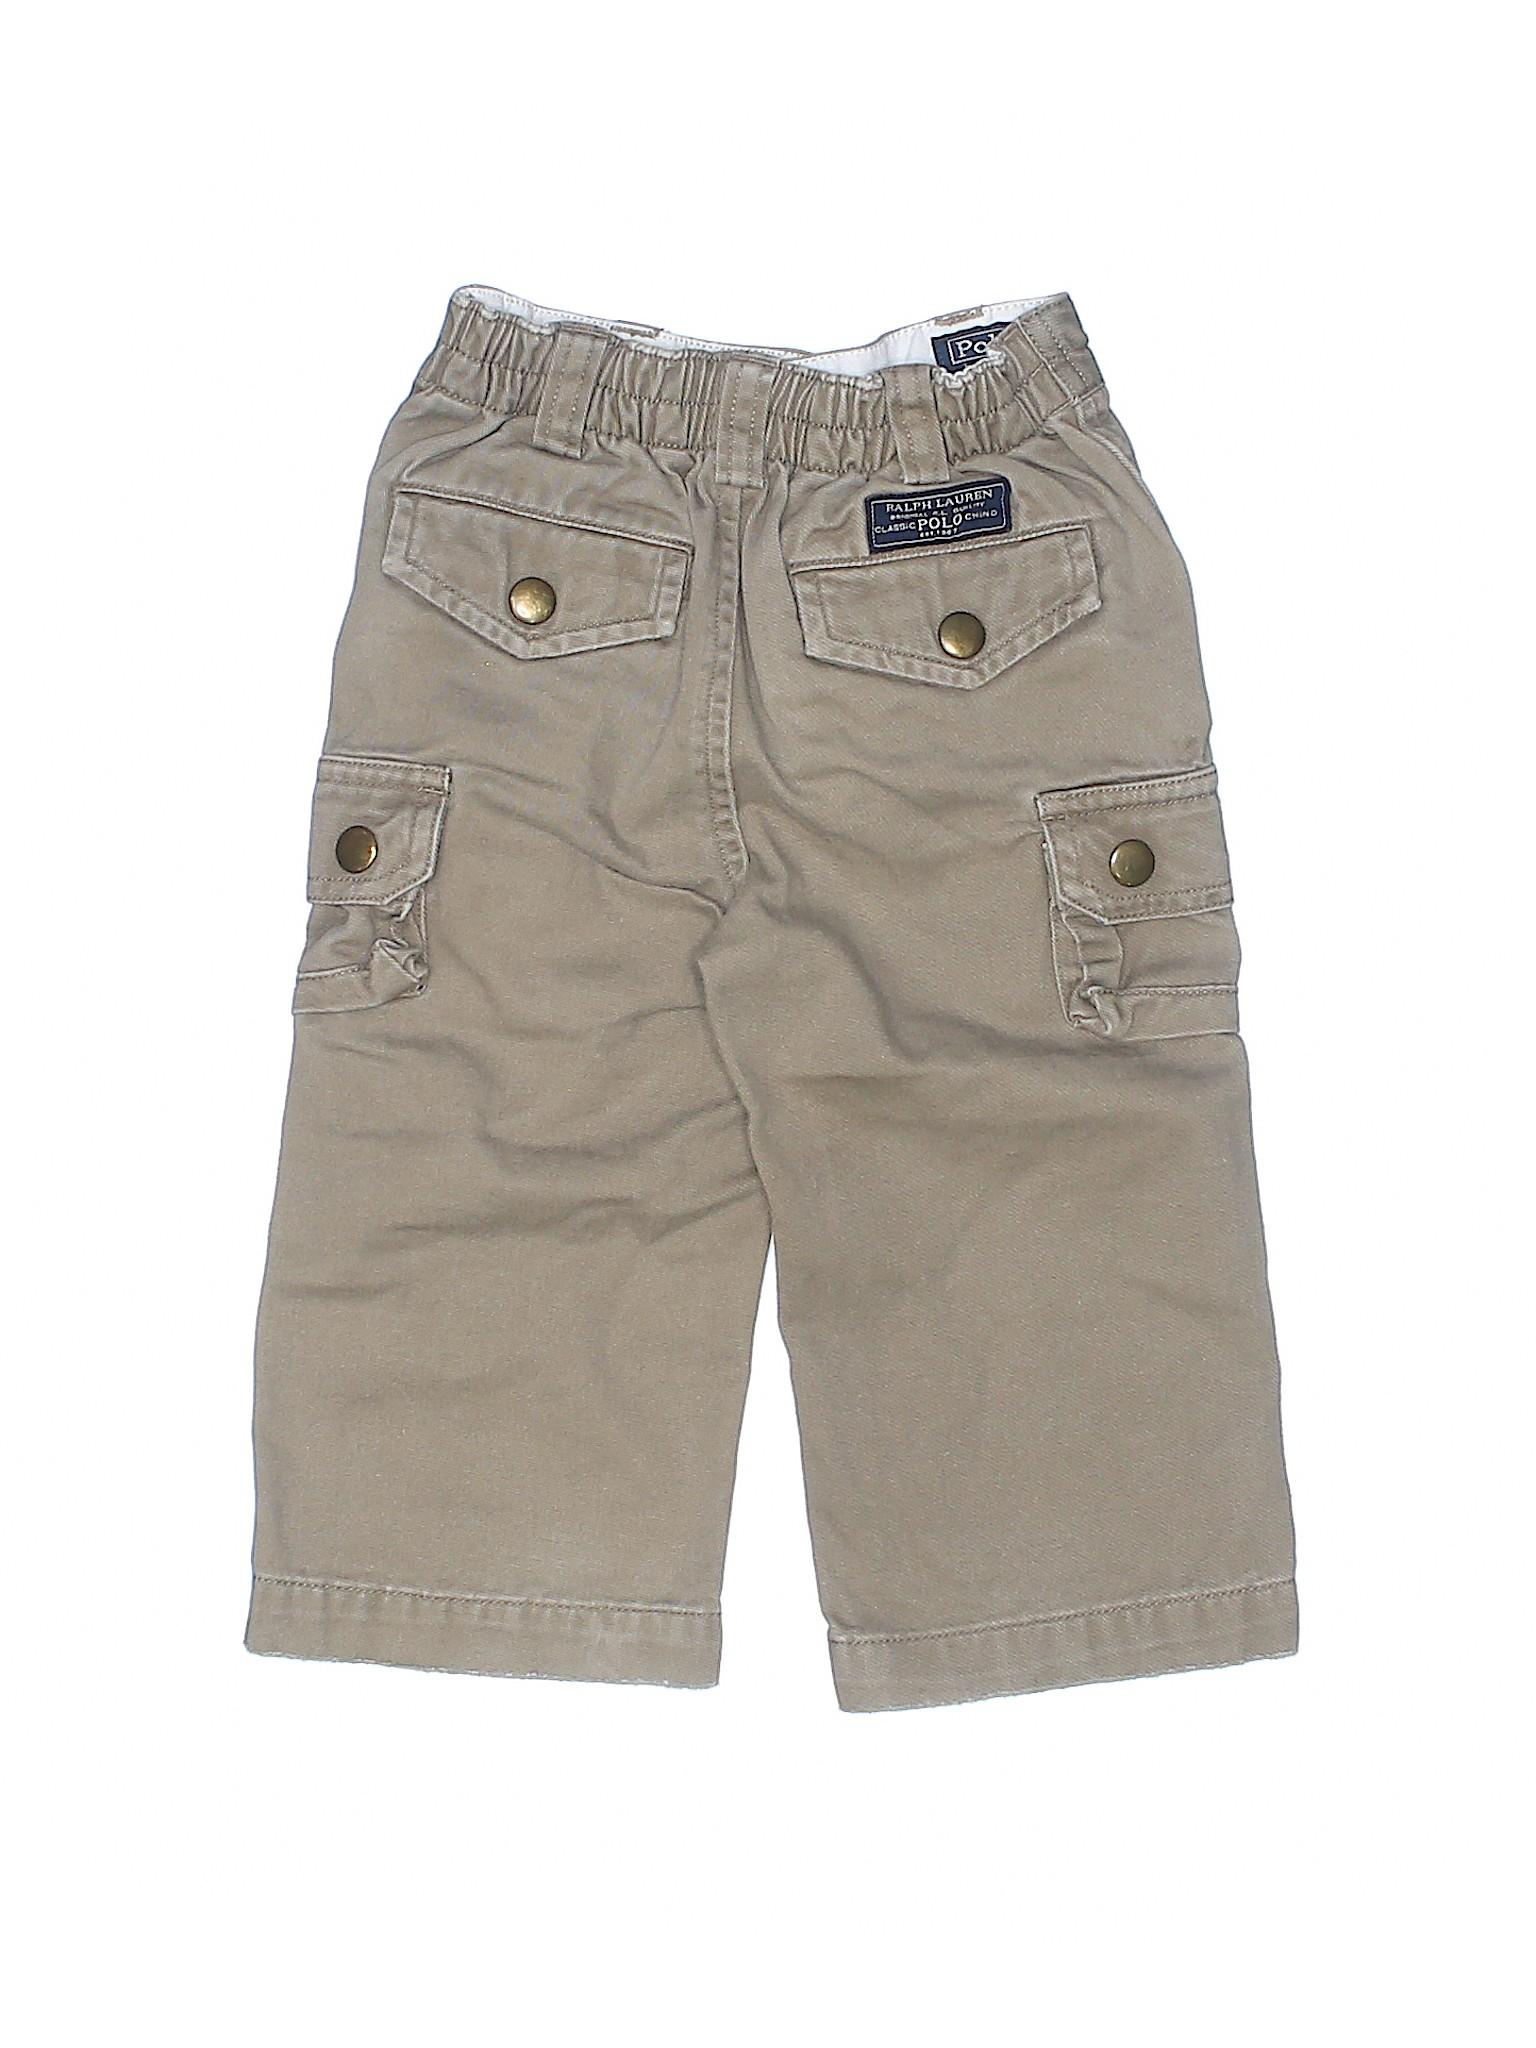 587c0f1a Cargo Pants